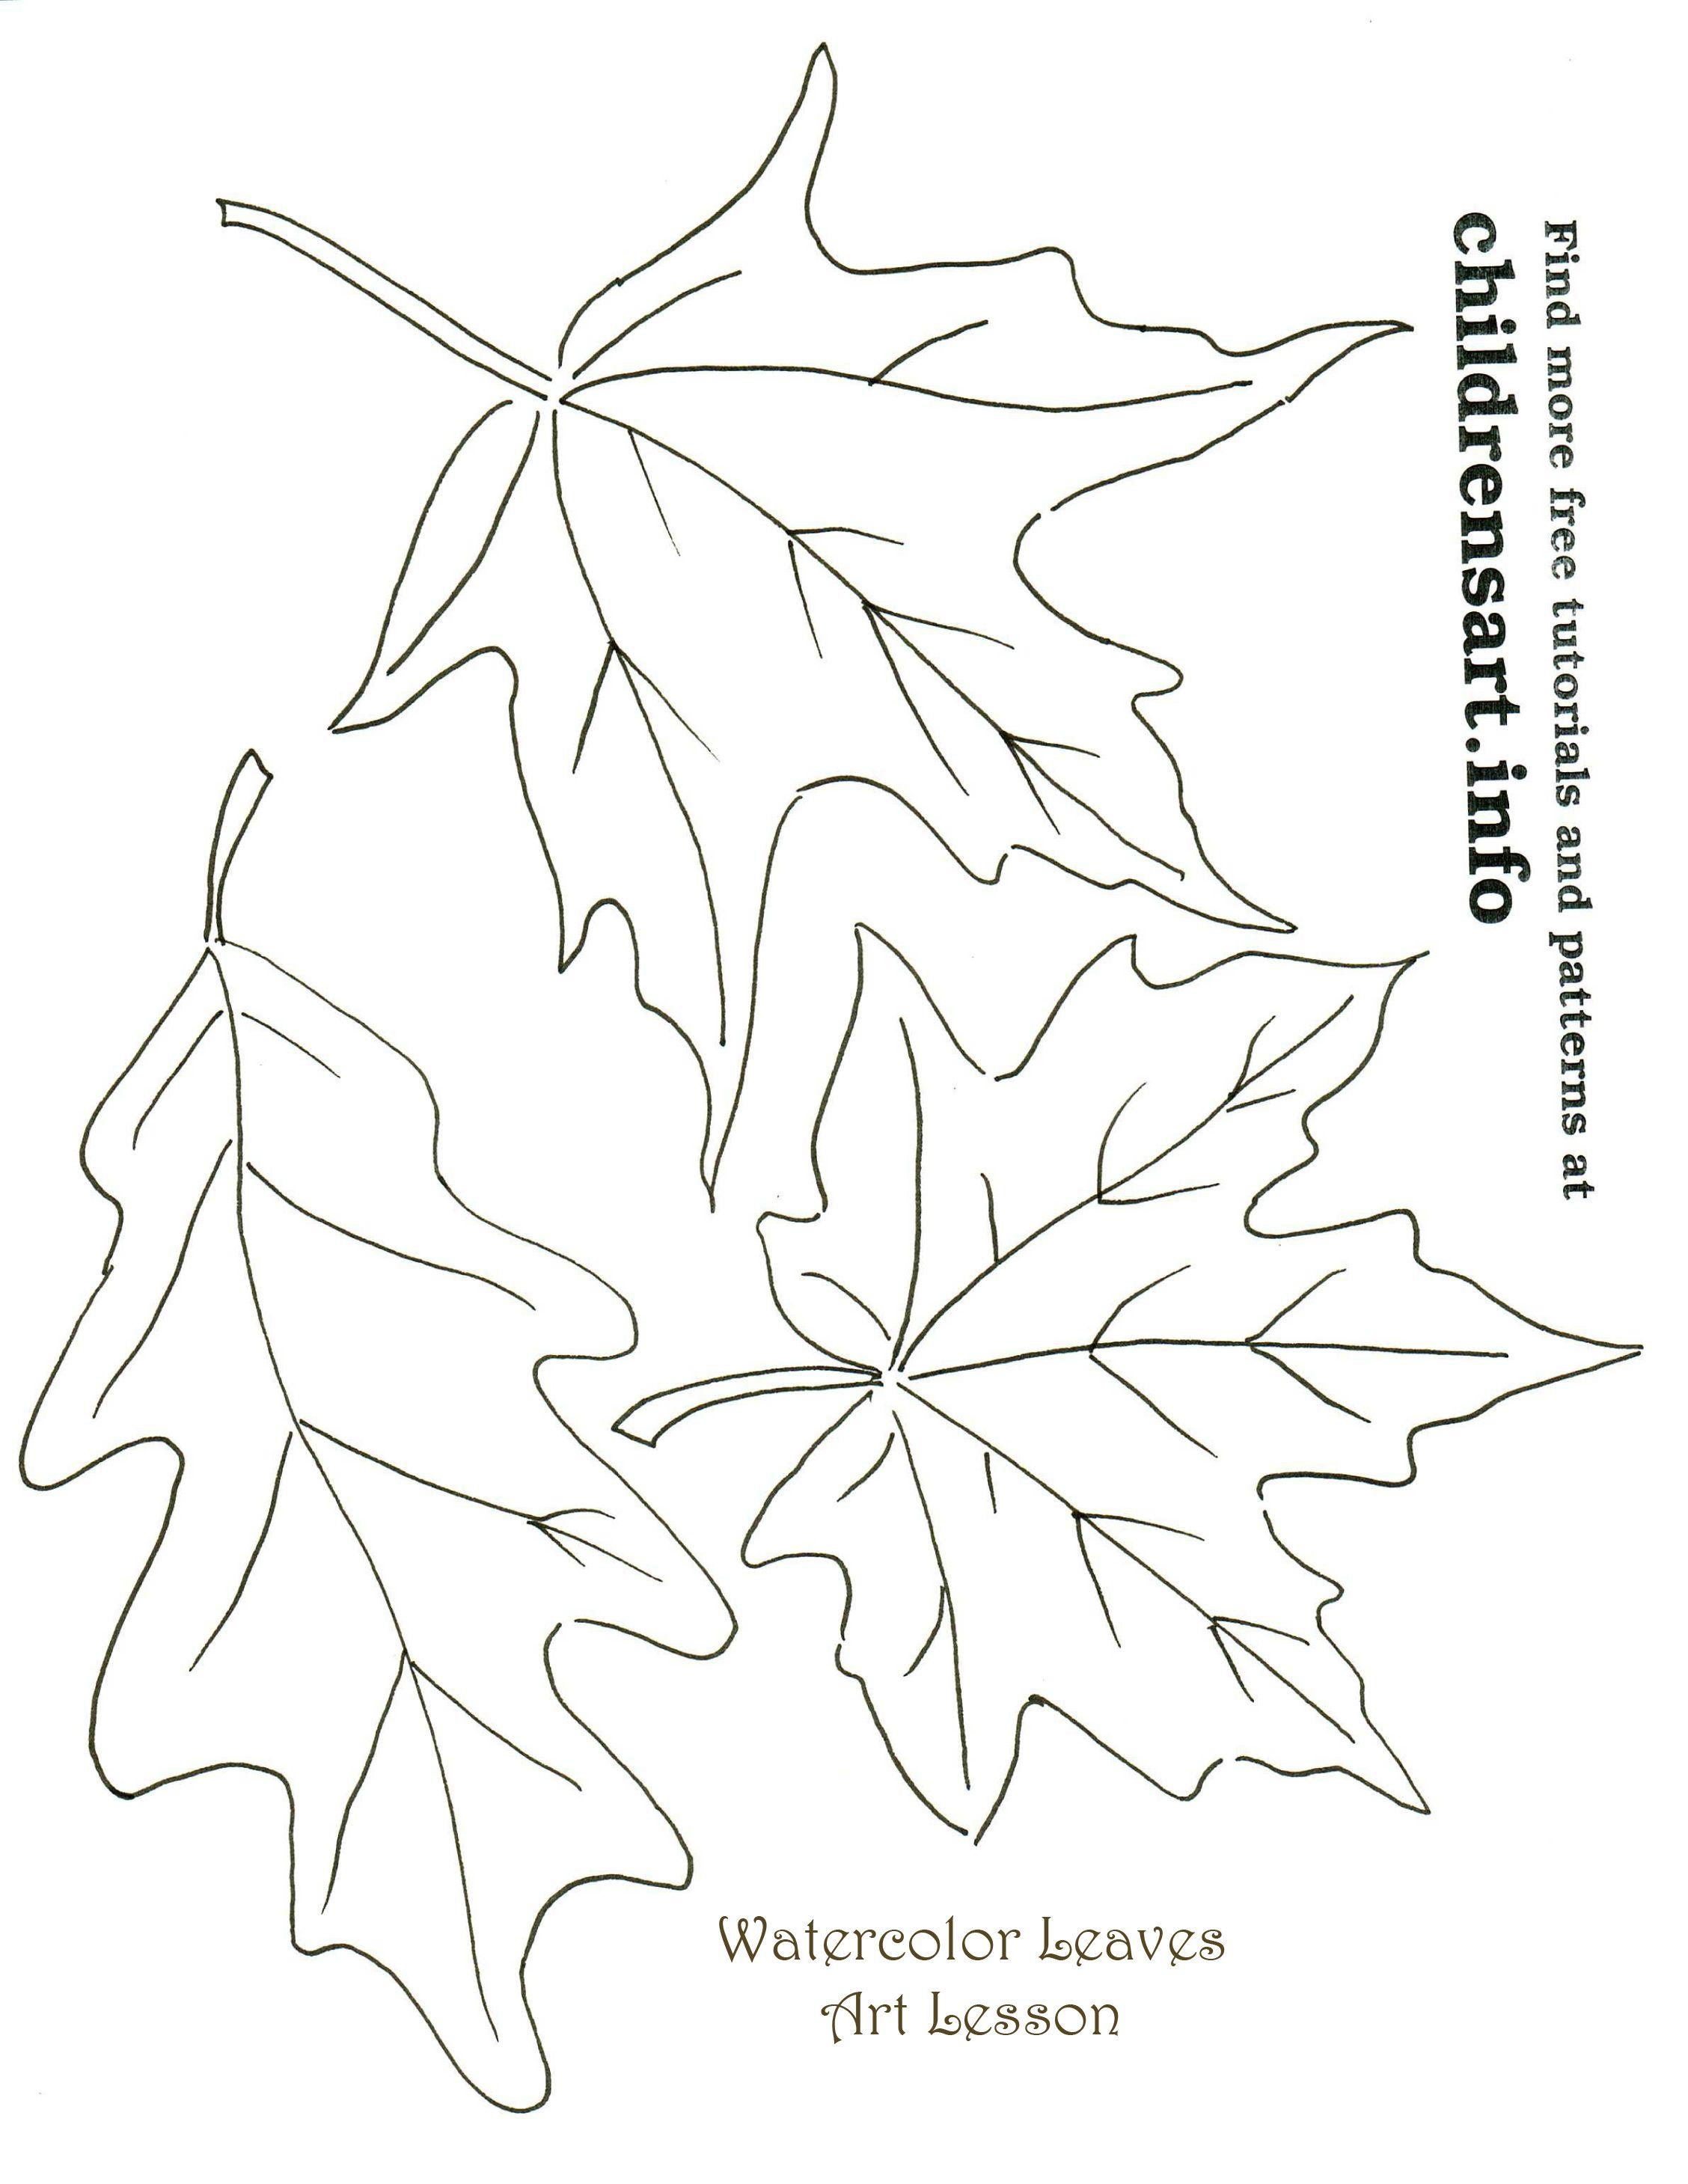 Autumn Leaves Watercolor Art Tutorial Templates